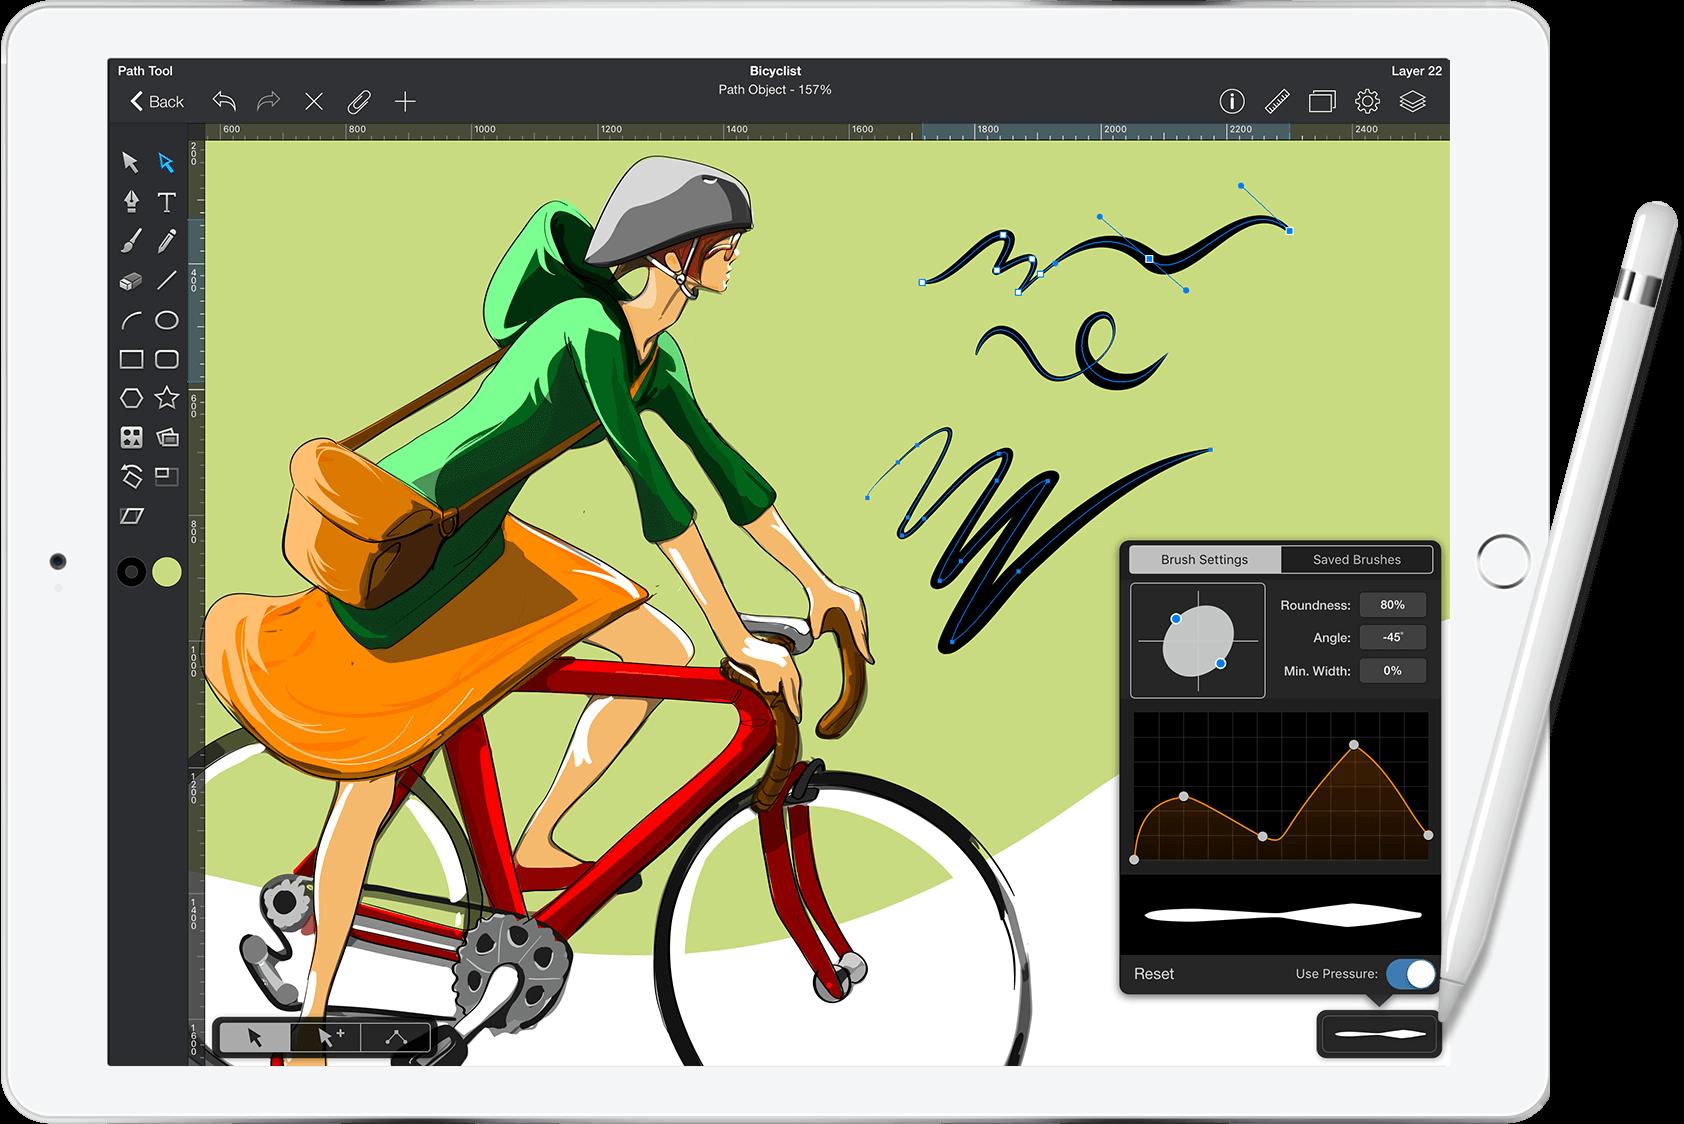 Graphic Ipad Pro Illustration And Graphic Design This App Looks Like A Good Alternative To Illustrator For The Ipad It Allows App Drawings Best Ipad Ipad,Bridal Lehenga Lehenga Blouse Designs Catalogue 2020